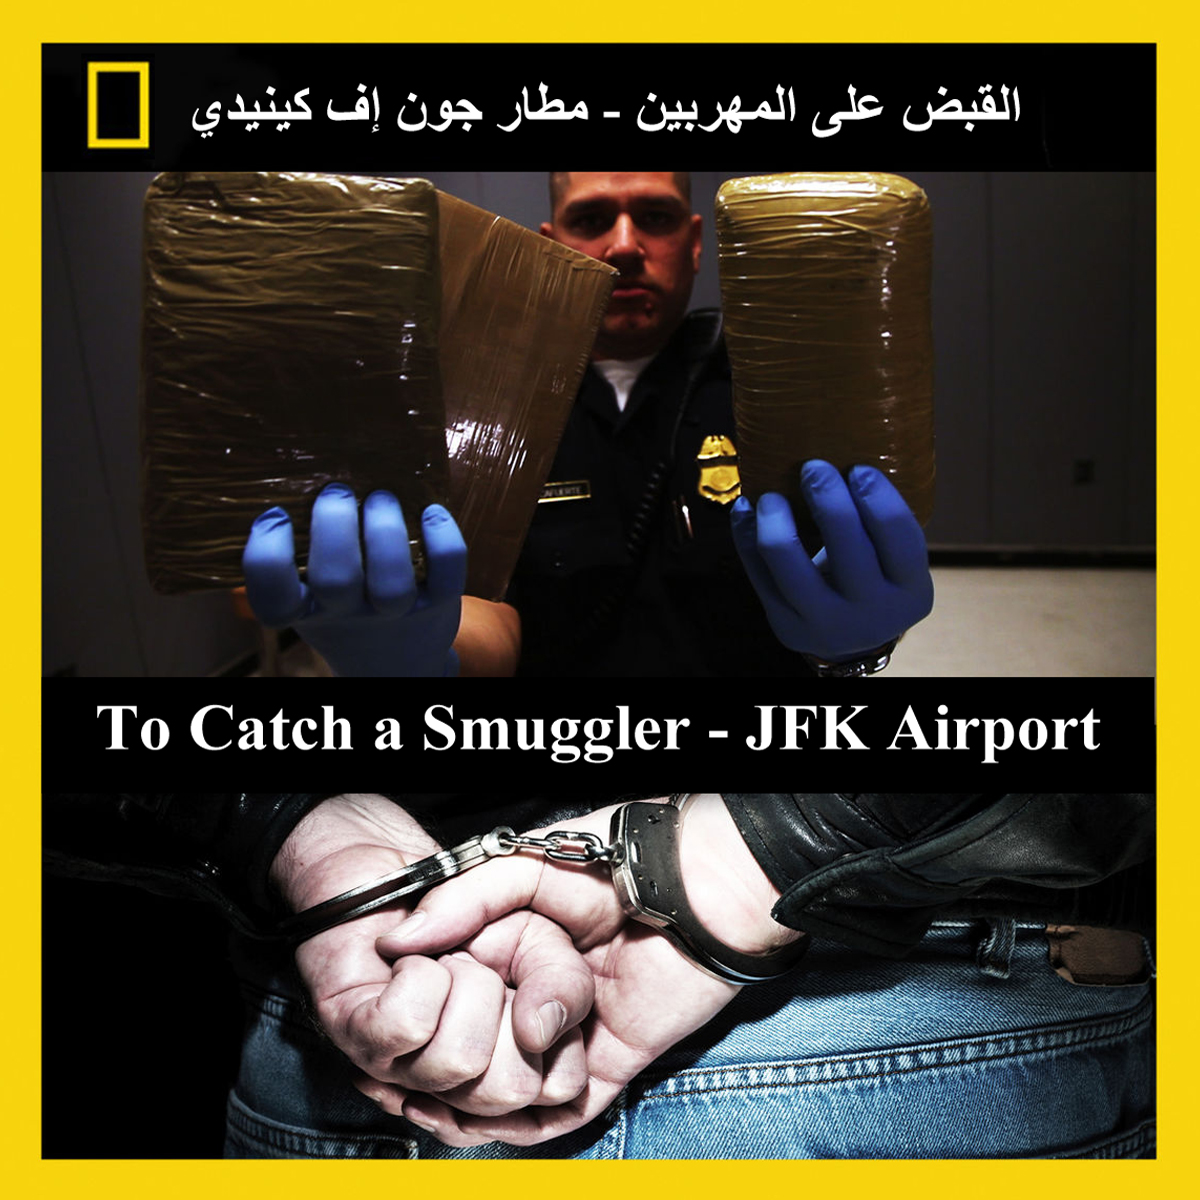 HDTV-1080p | القبض على المهربين: مطار جون إف كينيدي - البحث والاعتقال -- Seeders: 1 -- Leechers: 0